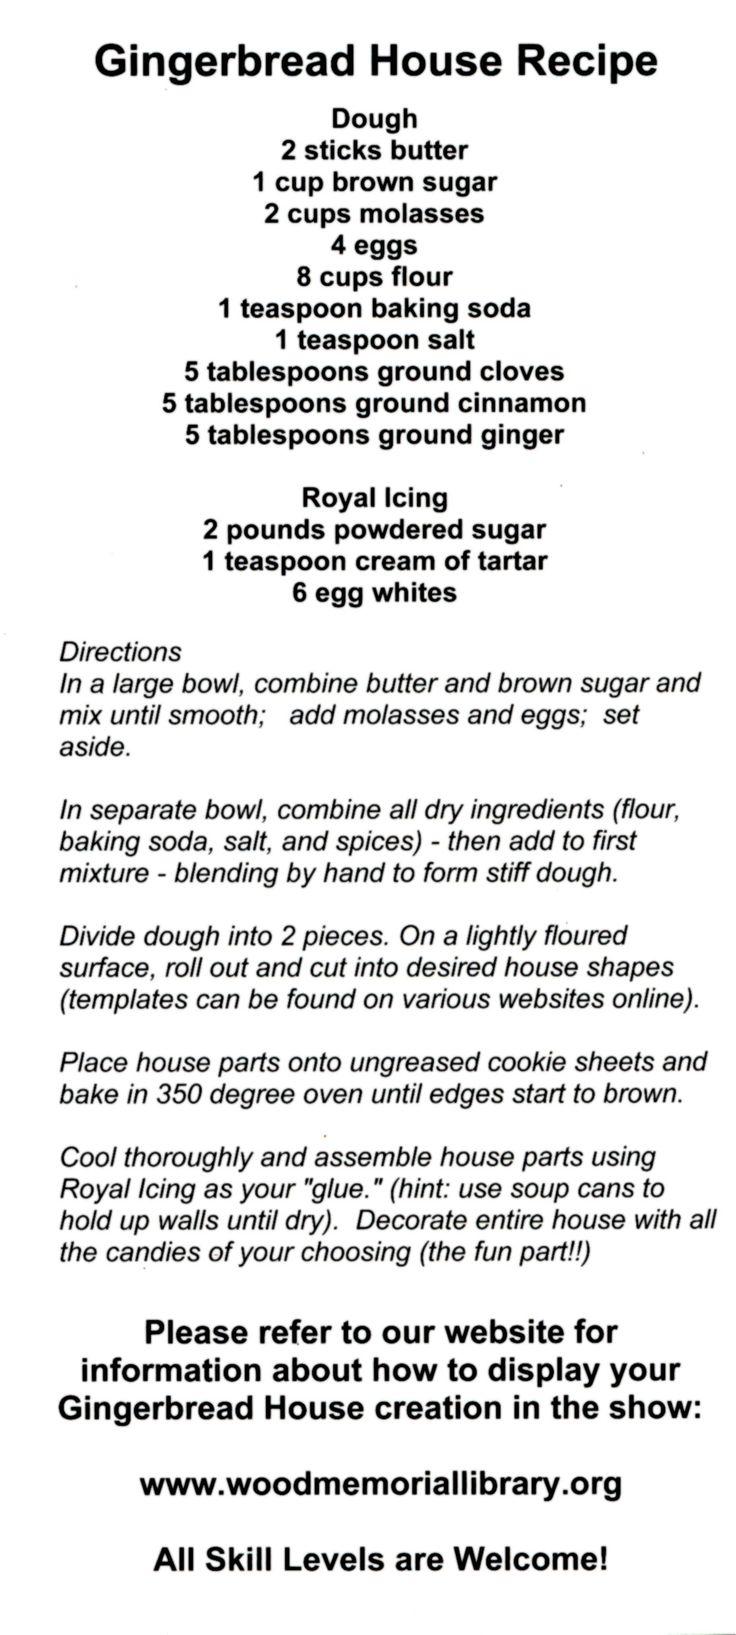 363e3ab1efd7ba64466abd8f193f7ad3--gingerbread-village-gingerbread-house-recipe